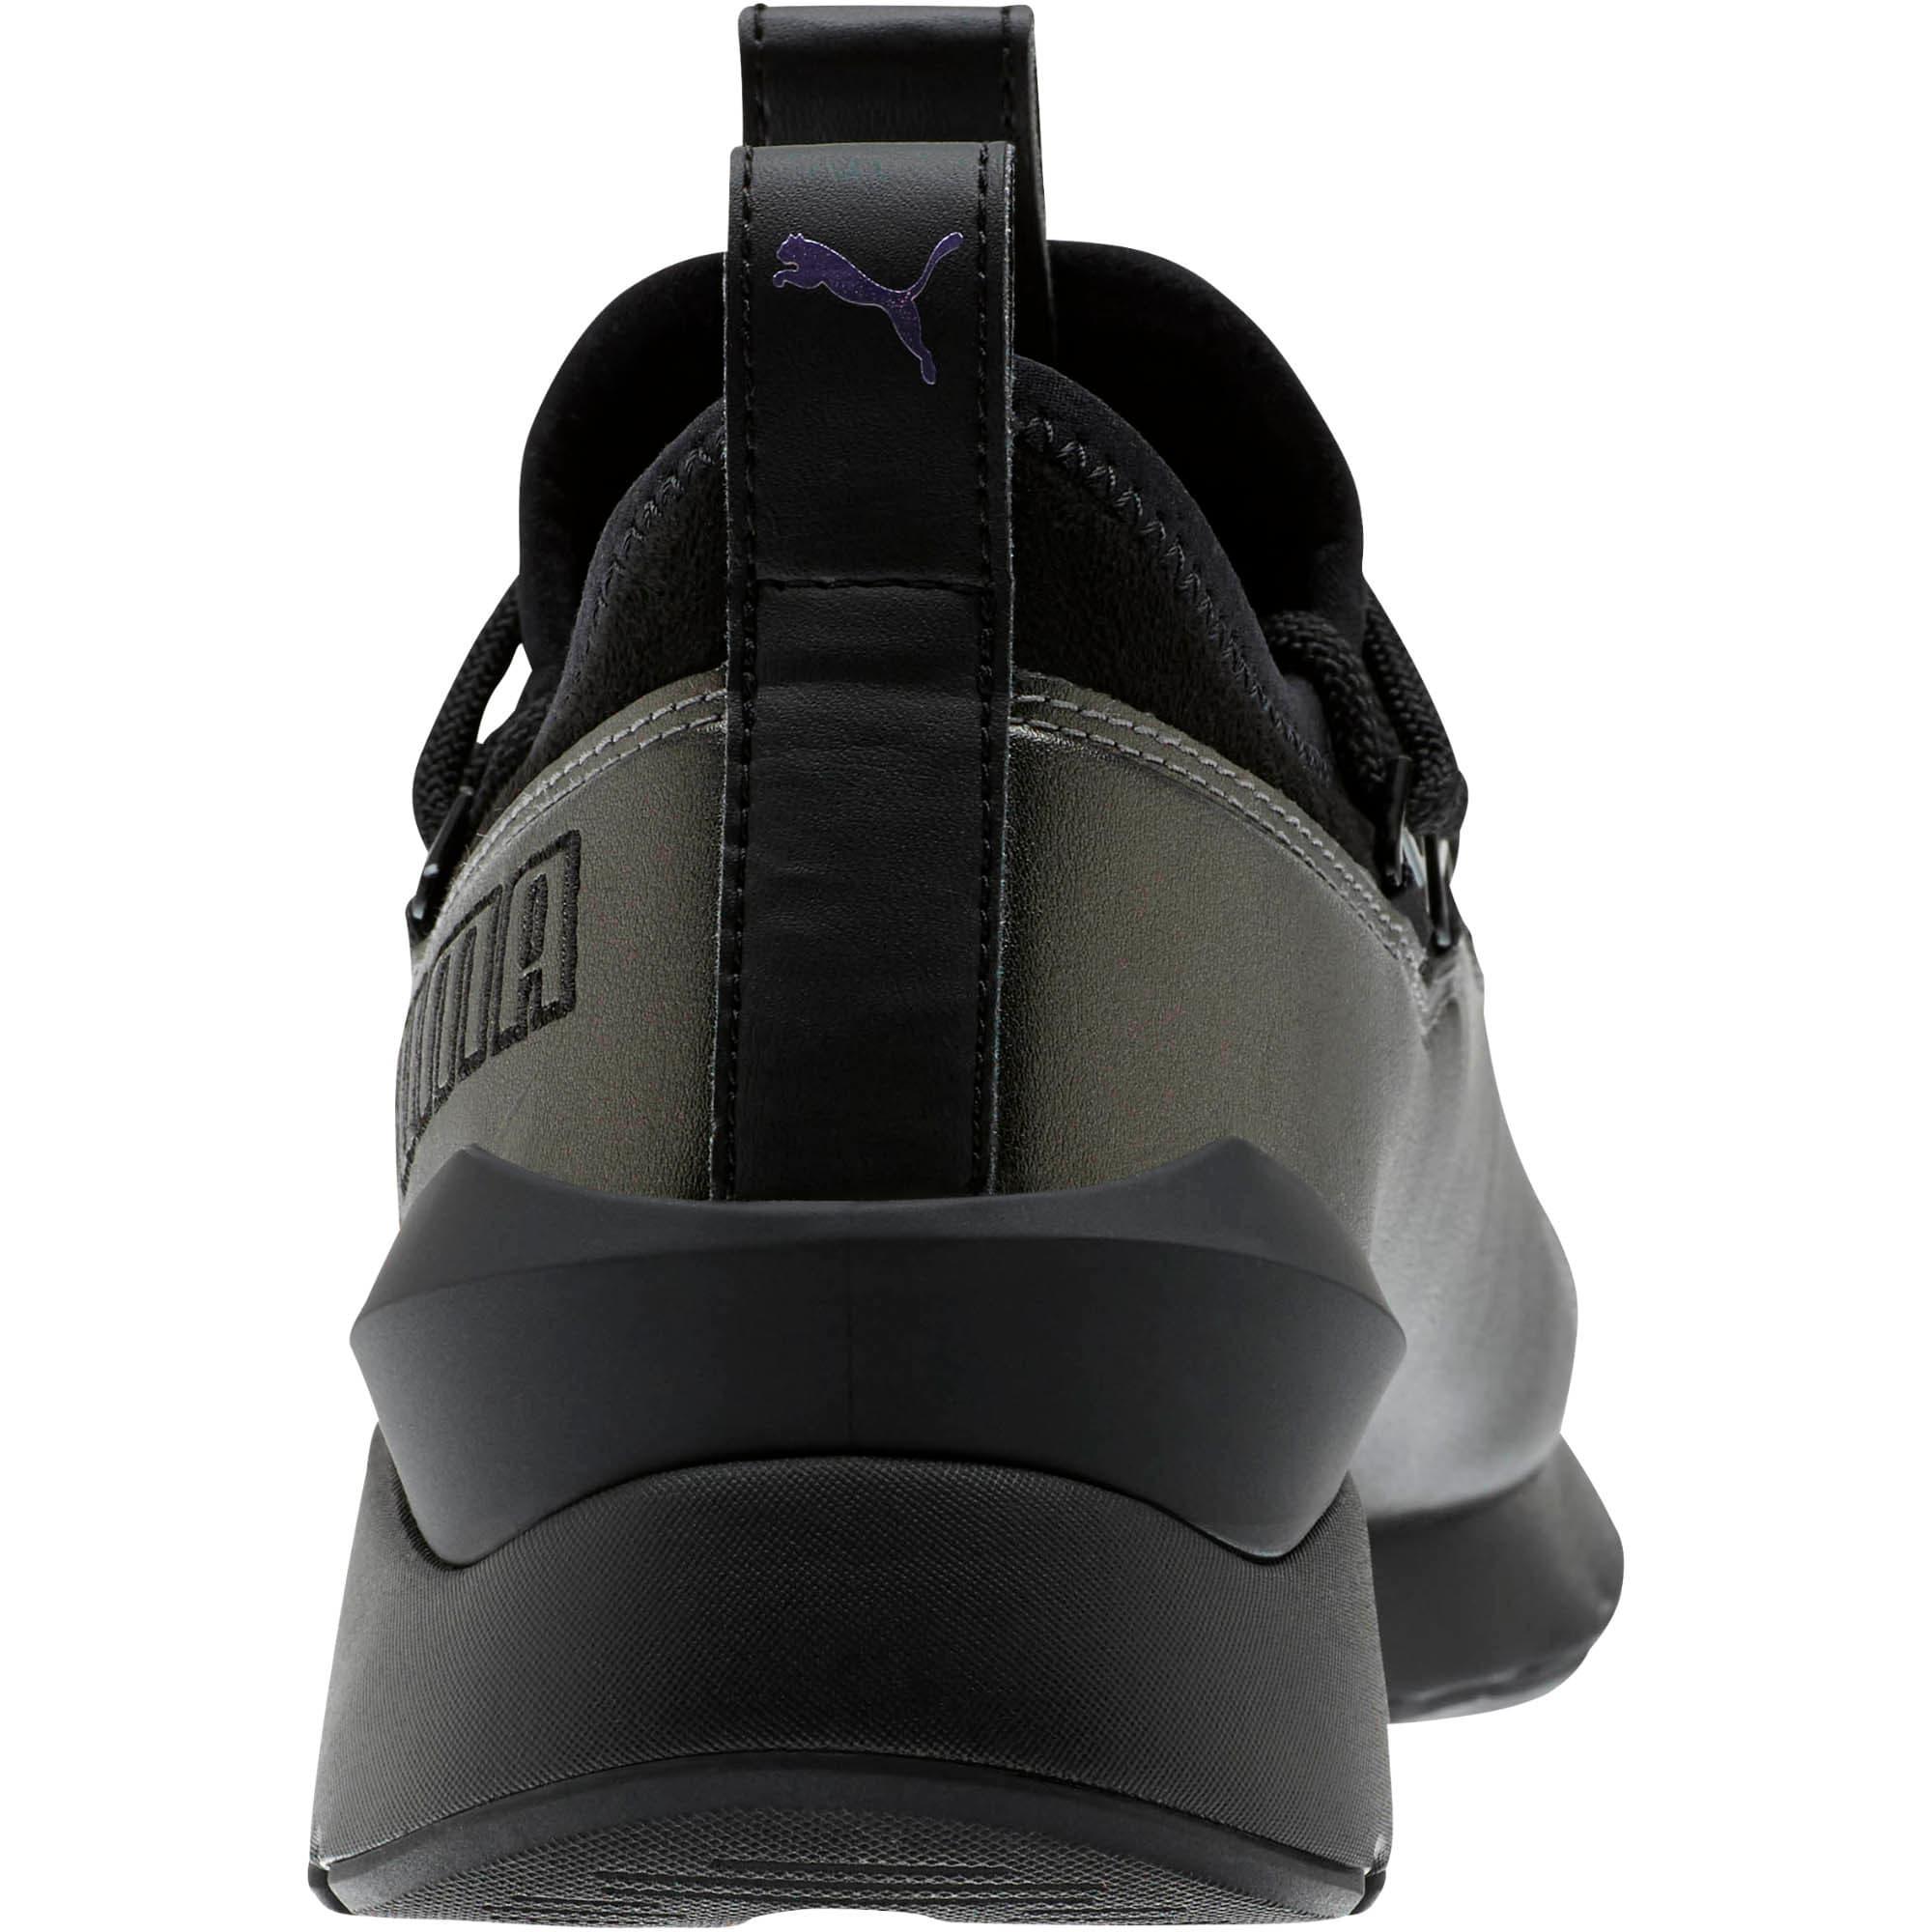 Miniatura 3 de Zapatos deportivosMuse 2 Twilight de mujer, Puma Black-Puma Black, mediano